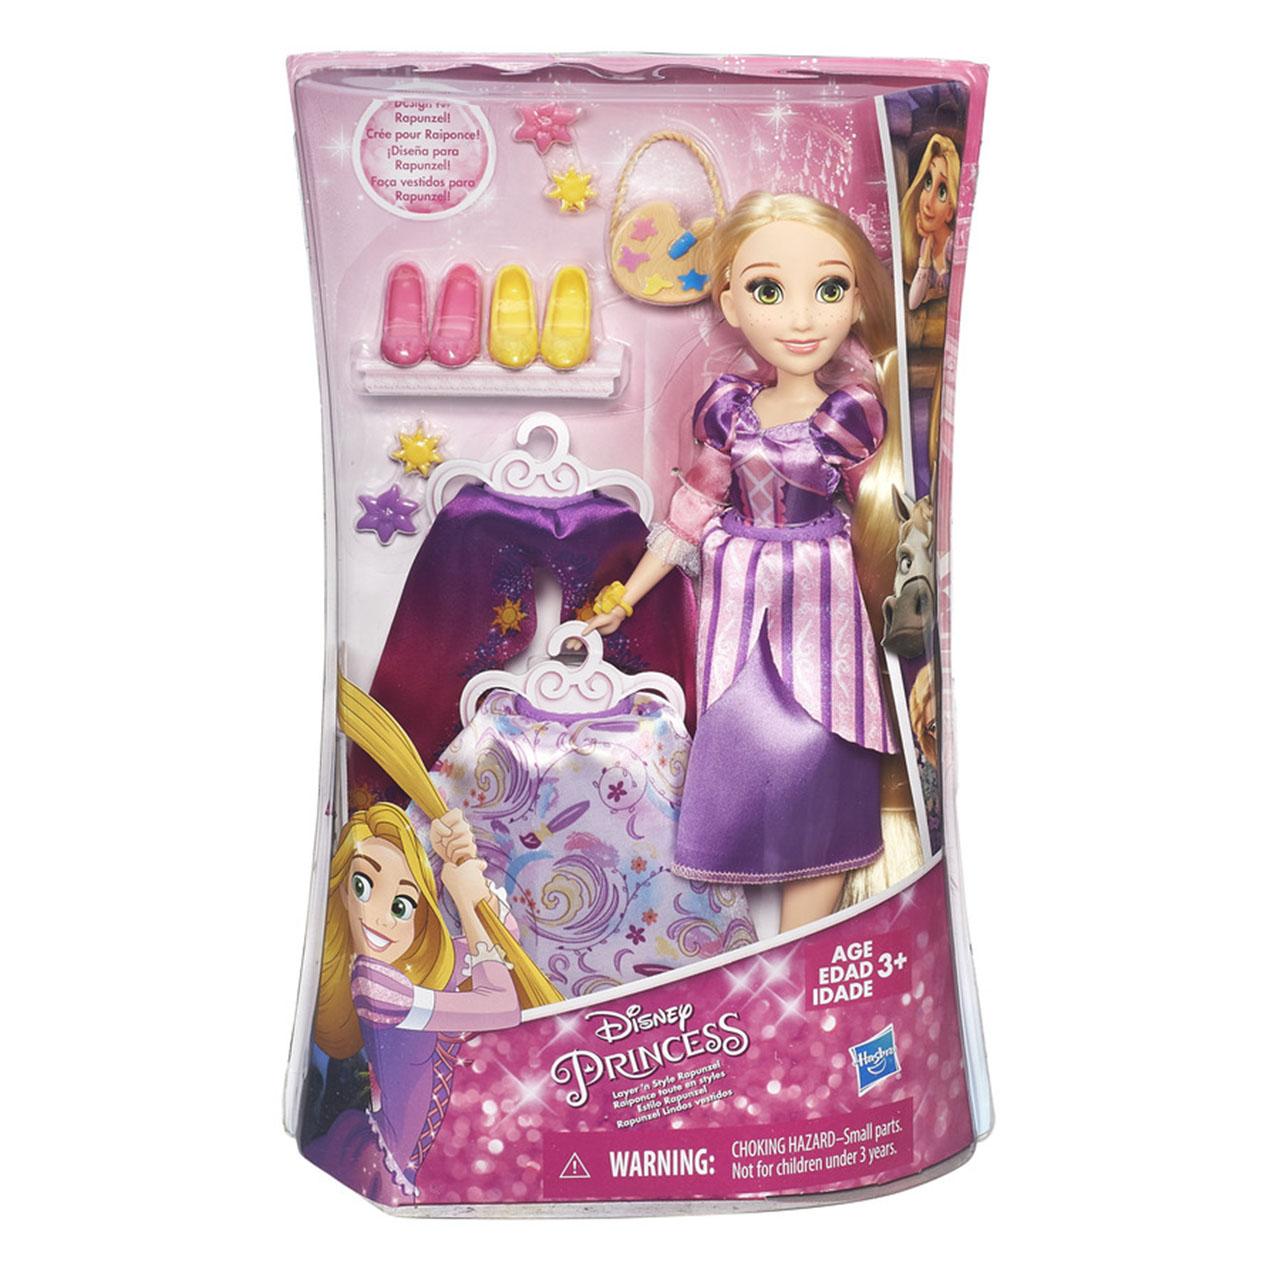 Disney Princess panenka s náhradními šaty Locika